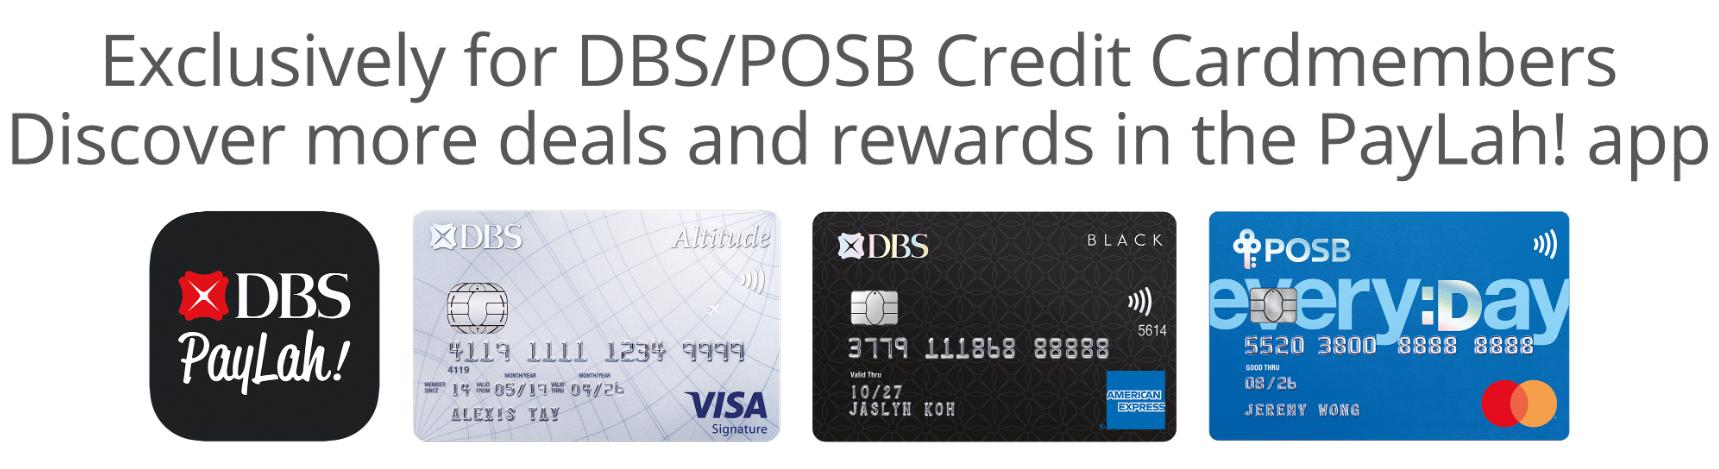 DBS exclusive